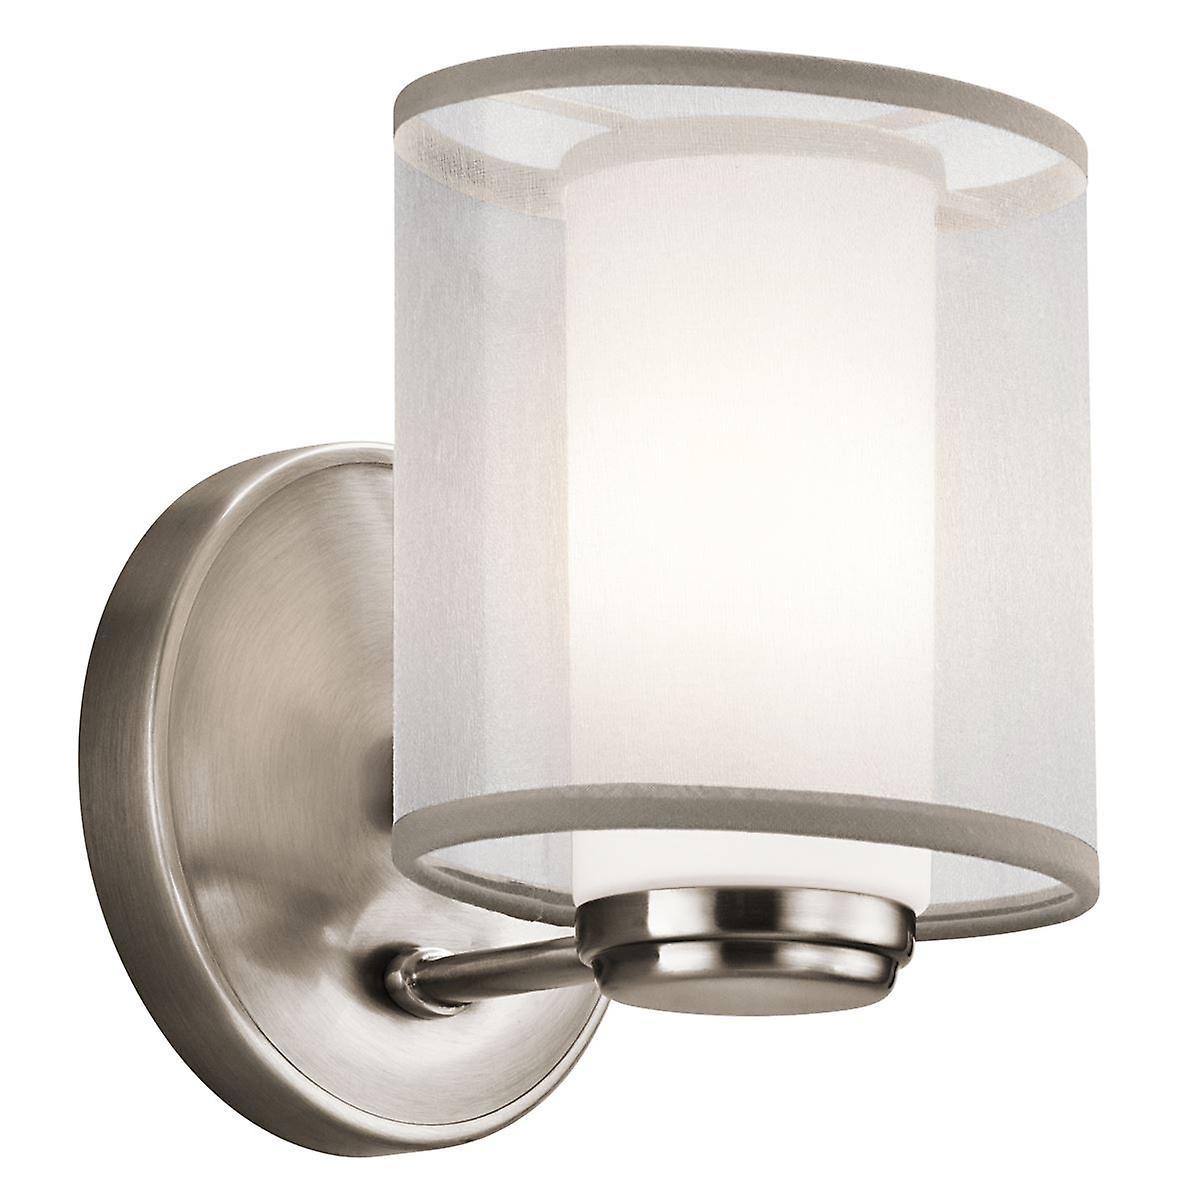 Saldana One Light Wall Light - Elstead Lighting Kl   KL SALDANA1